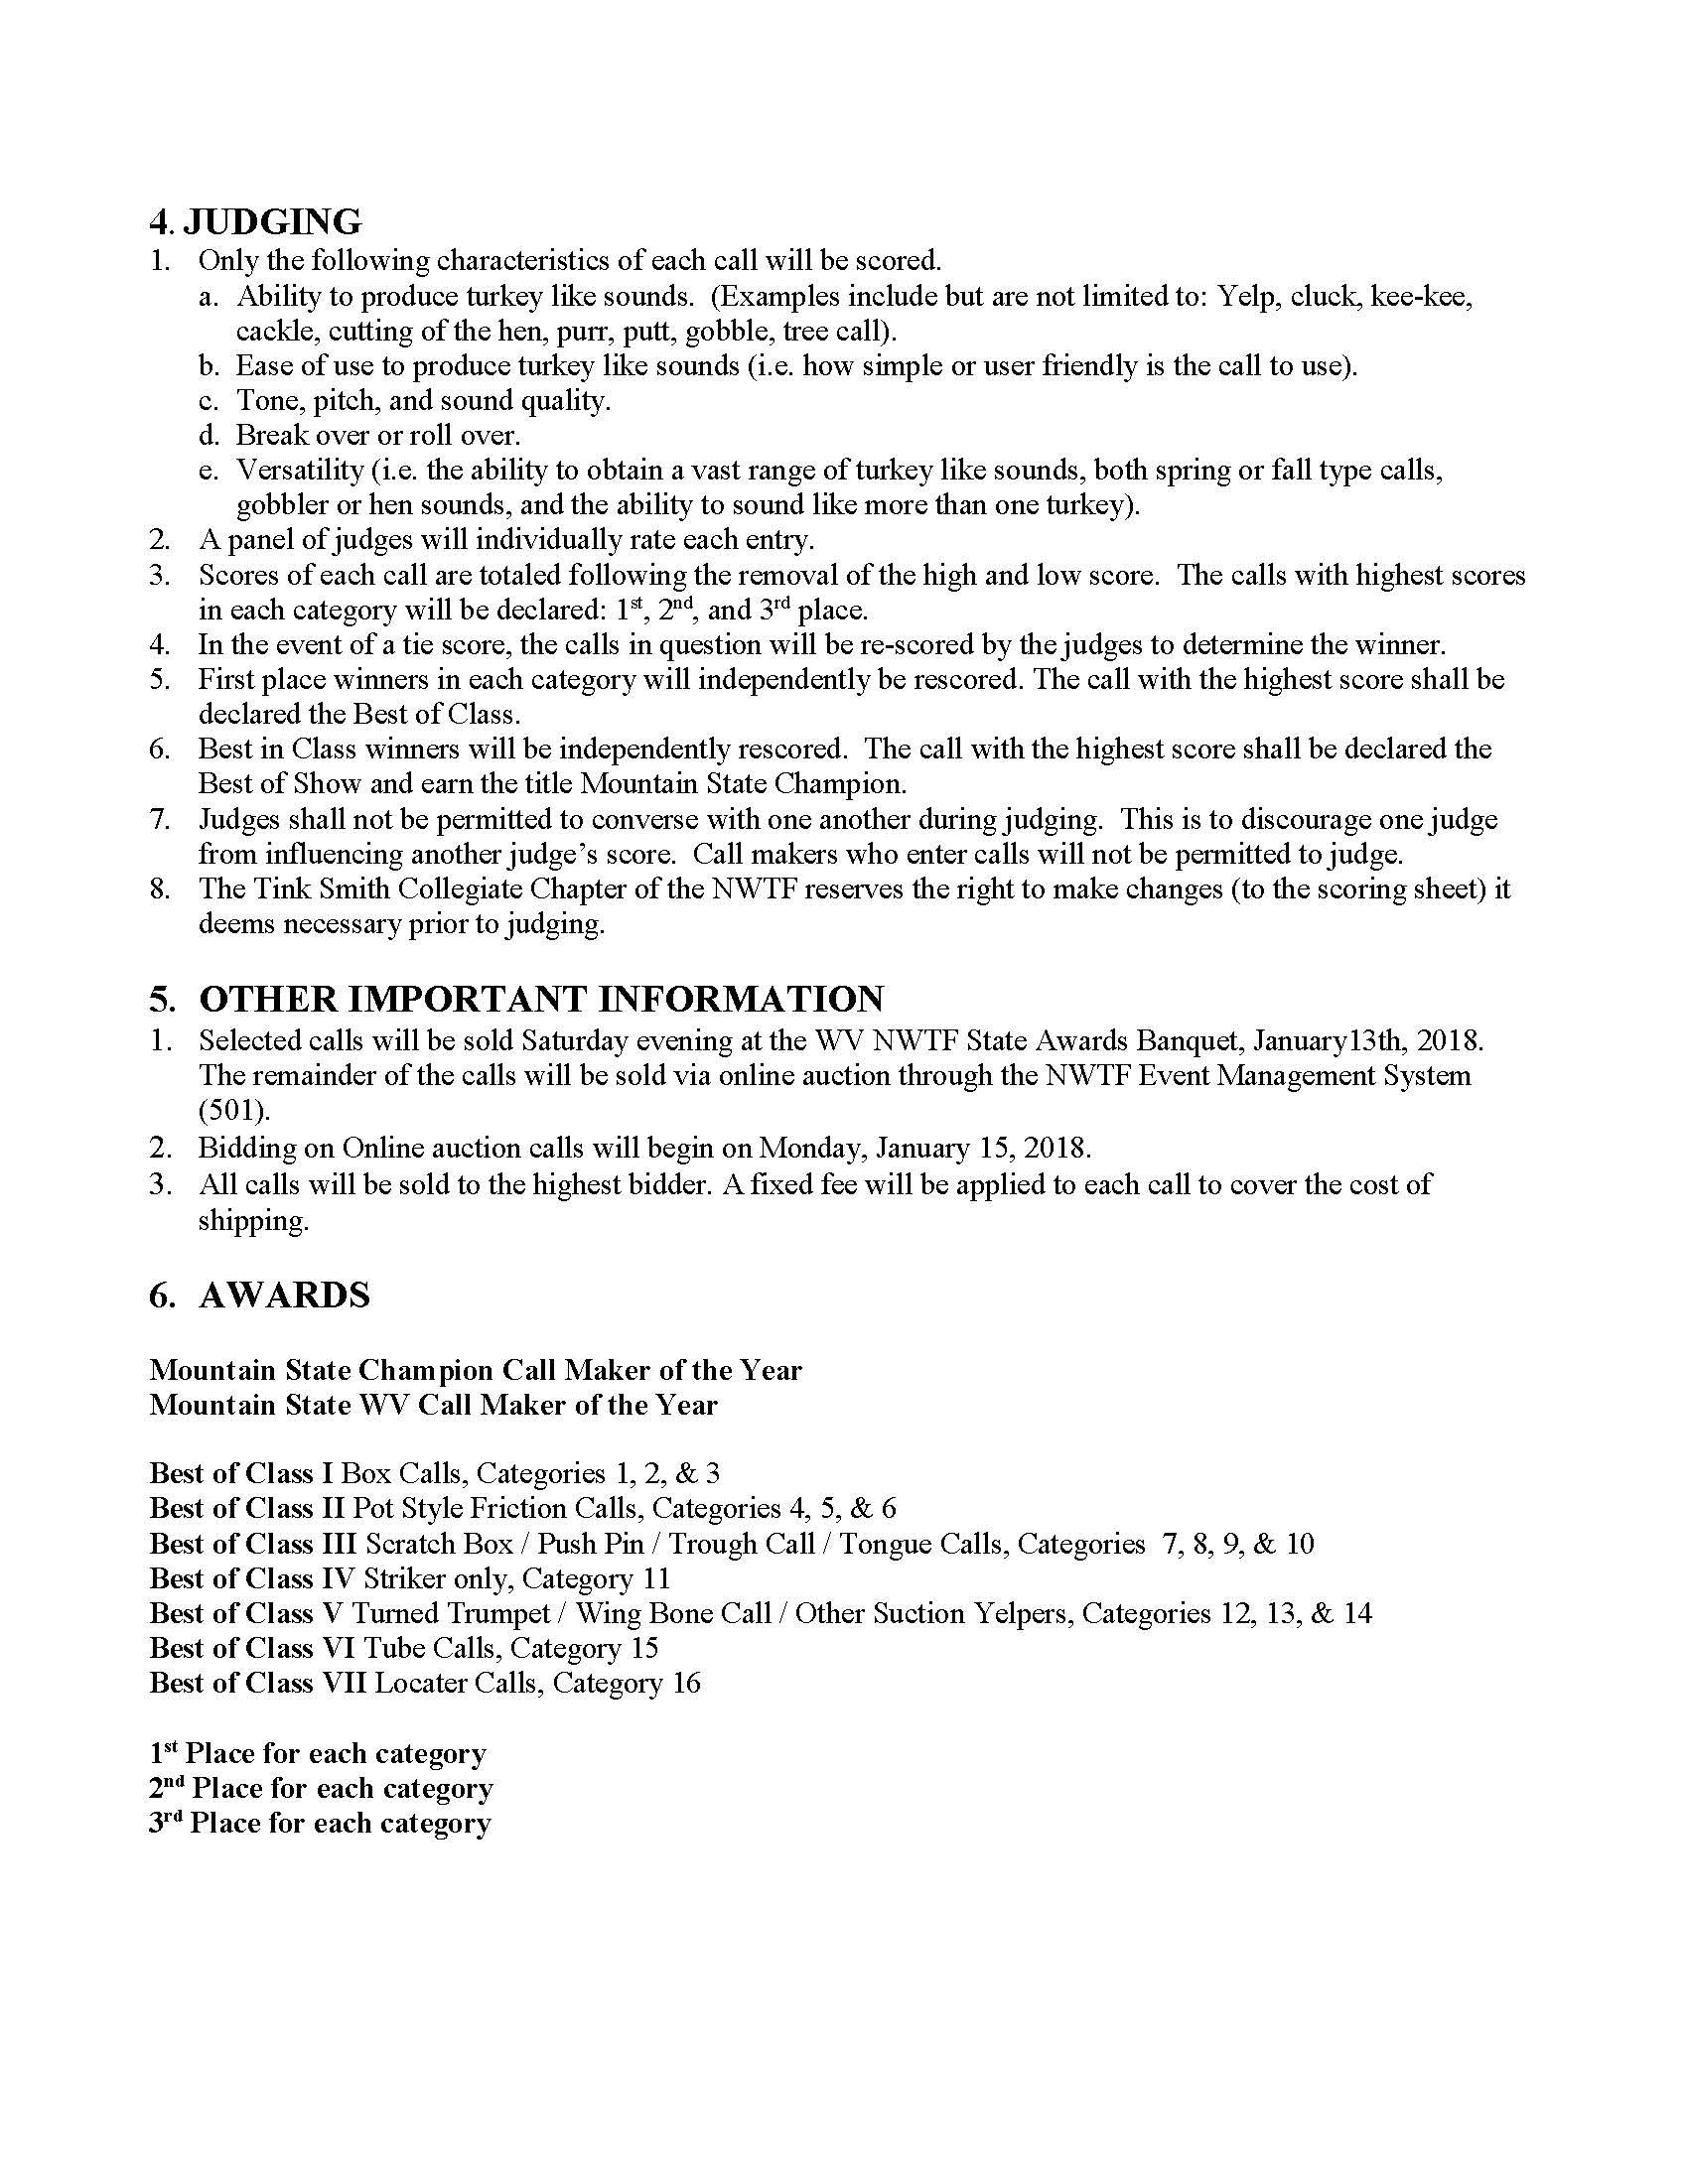 MSC_CallMakers_Page_3.jpg